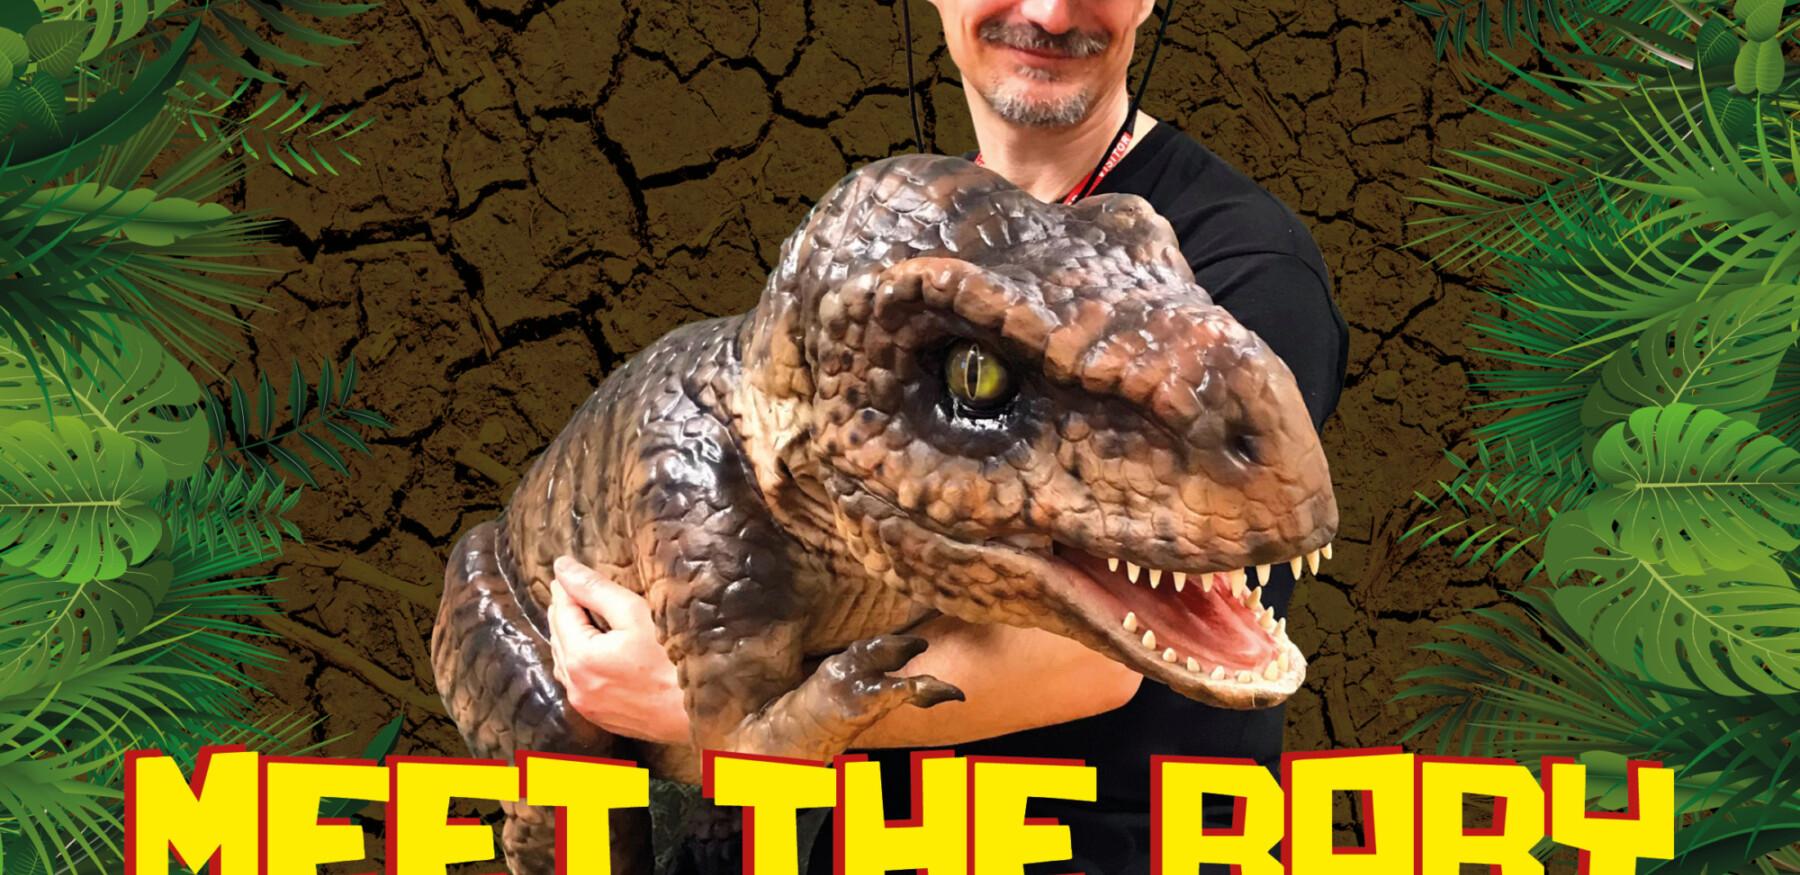 Dino Event Graphics FB Image 4 Meet the Baby Dinos 1200x1200